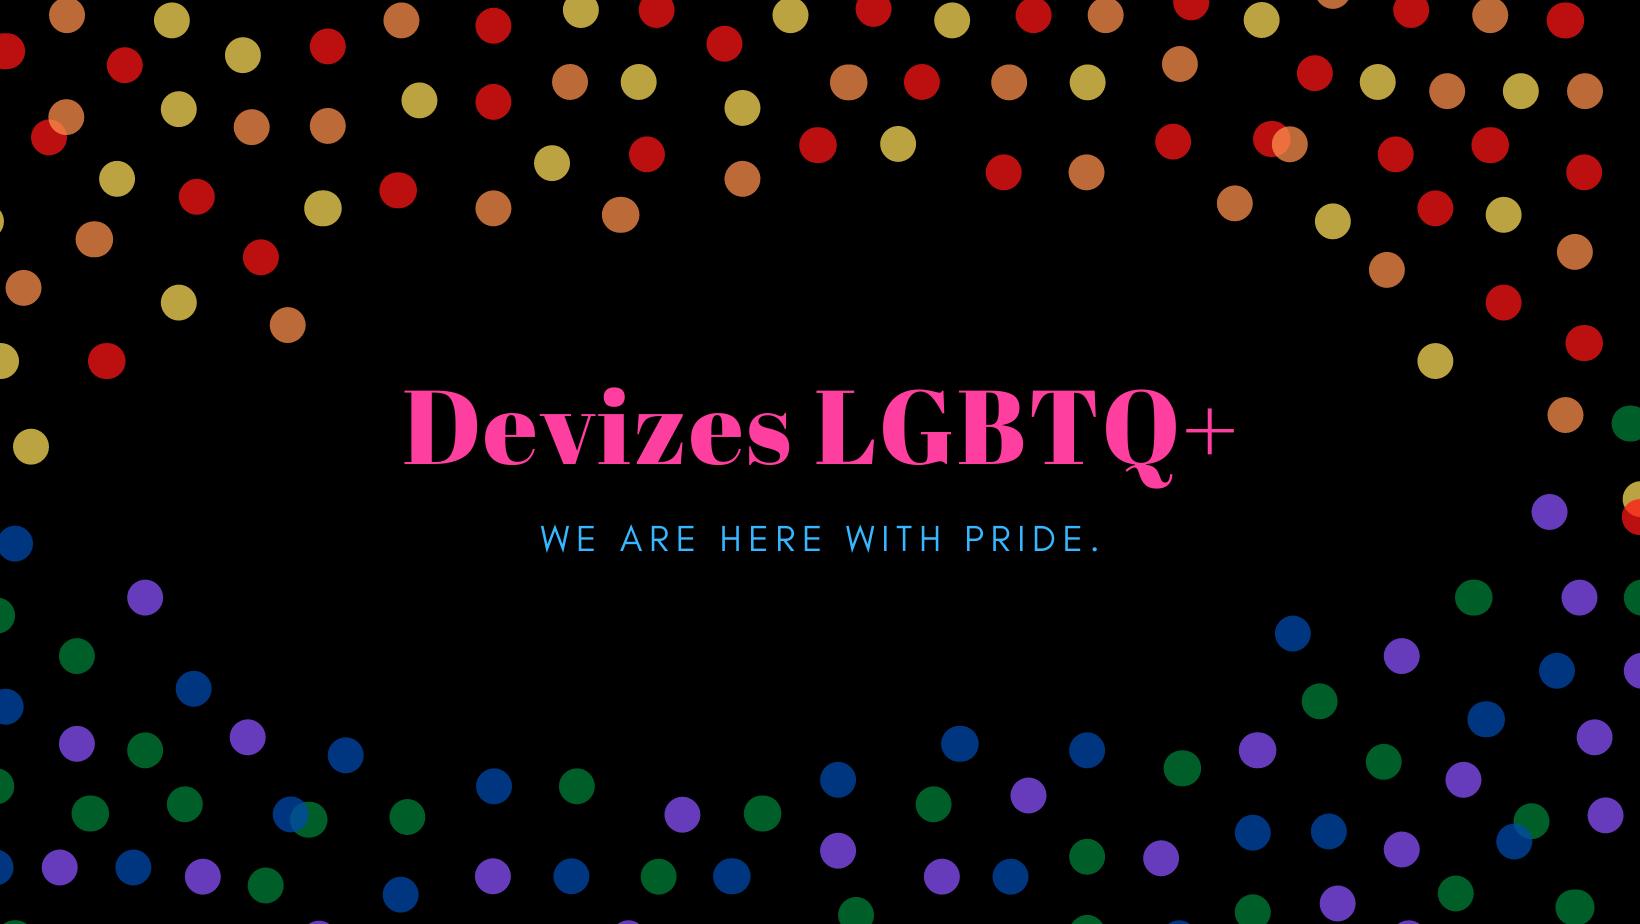 Devizes; an LGBTQ+-Friendly Community, a Devizes Pride?